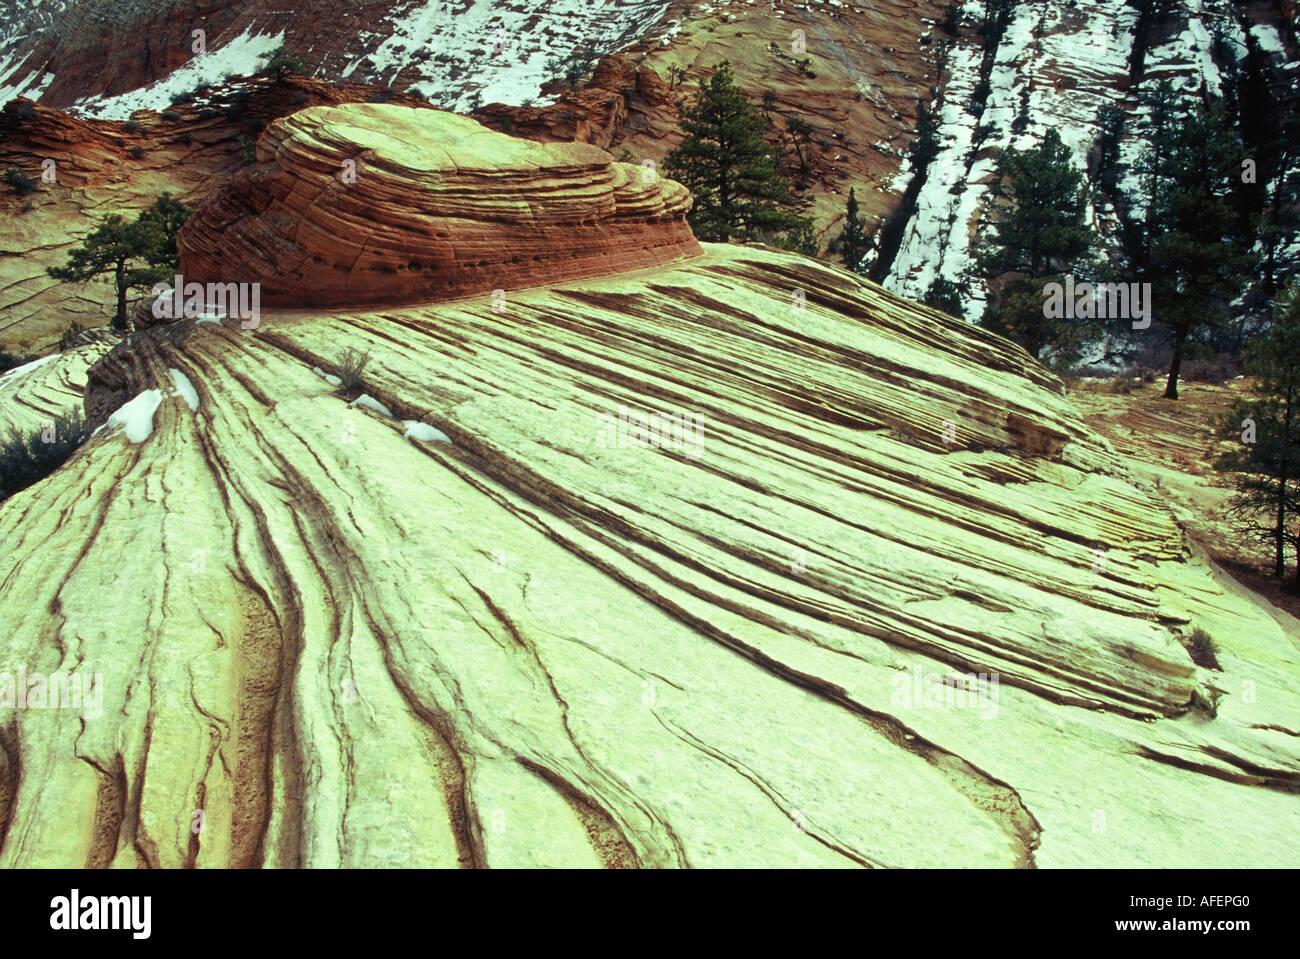 Sedimentary rock strata - Stock Image